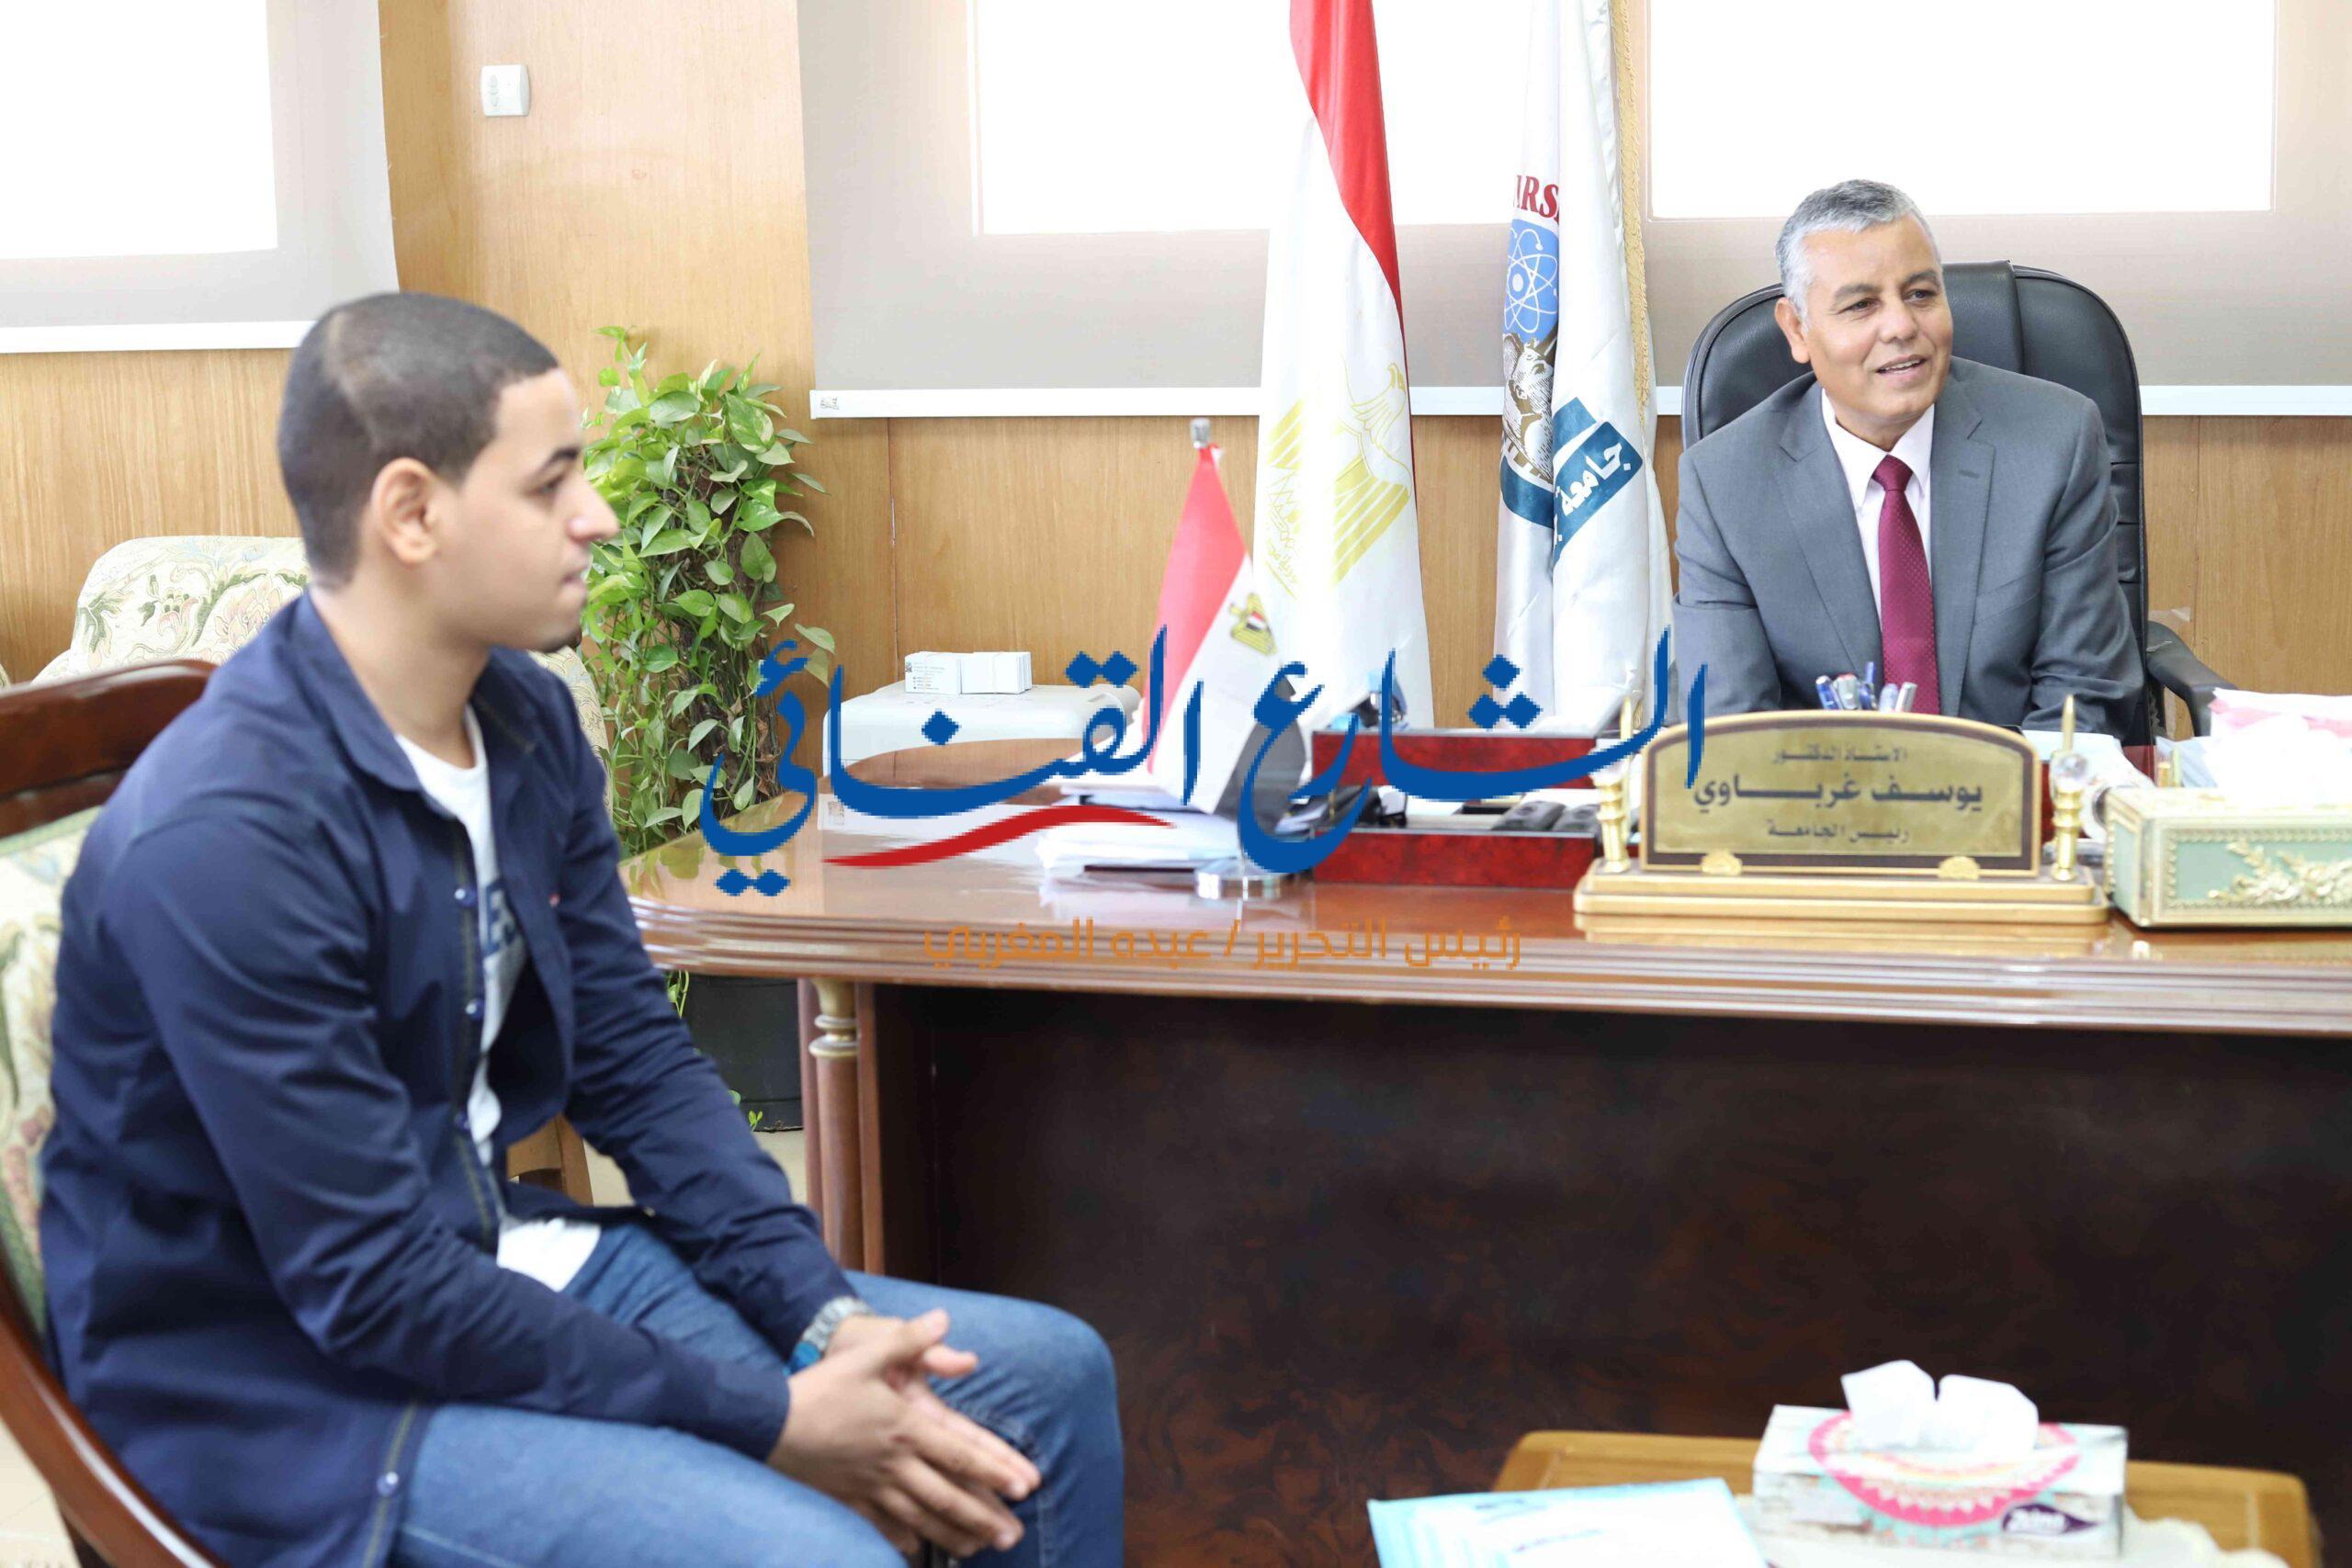 "Photo of غرباوي"" يعفي ""طالب الطب"" من المصروفات ويقرر تسكينه بالمدينة الجامعية"